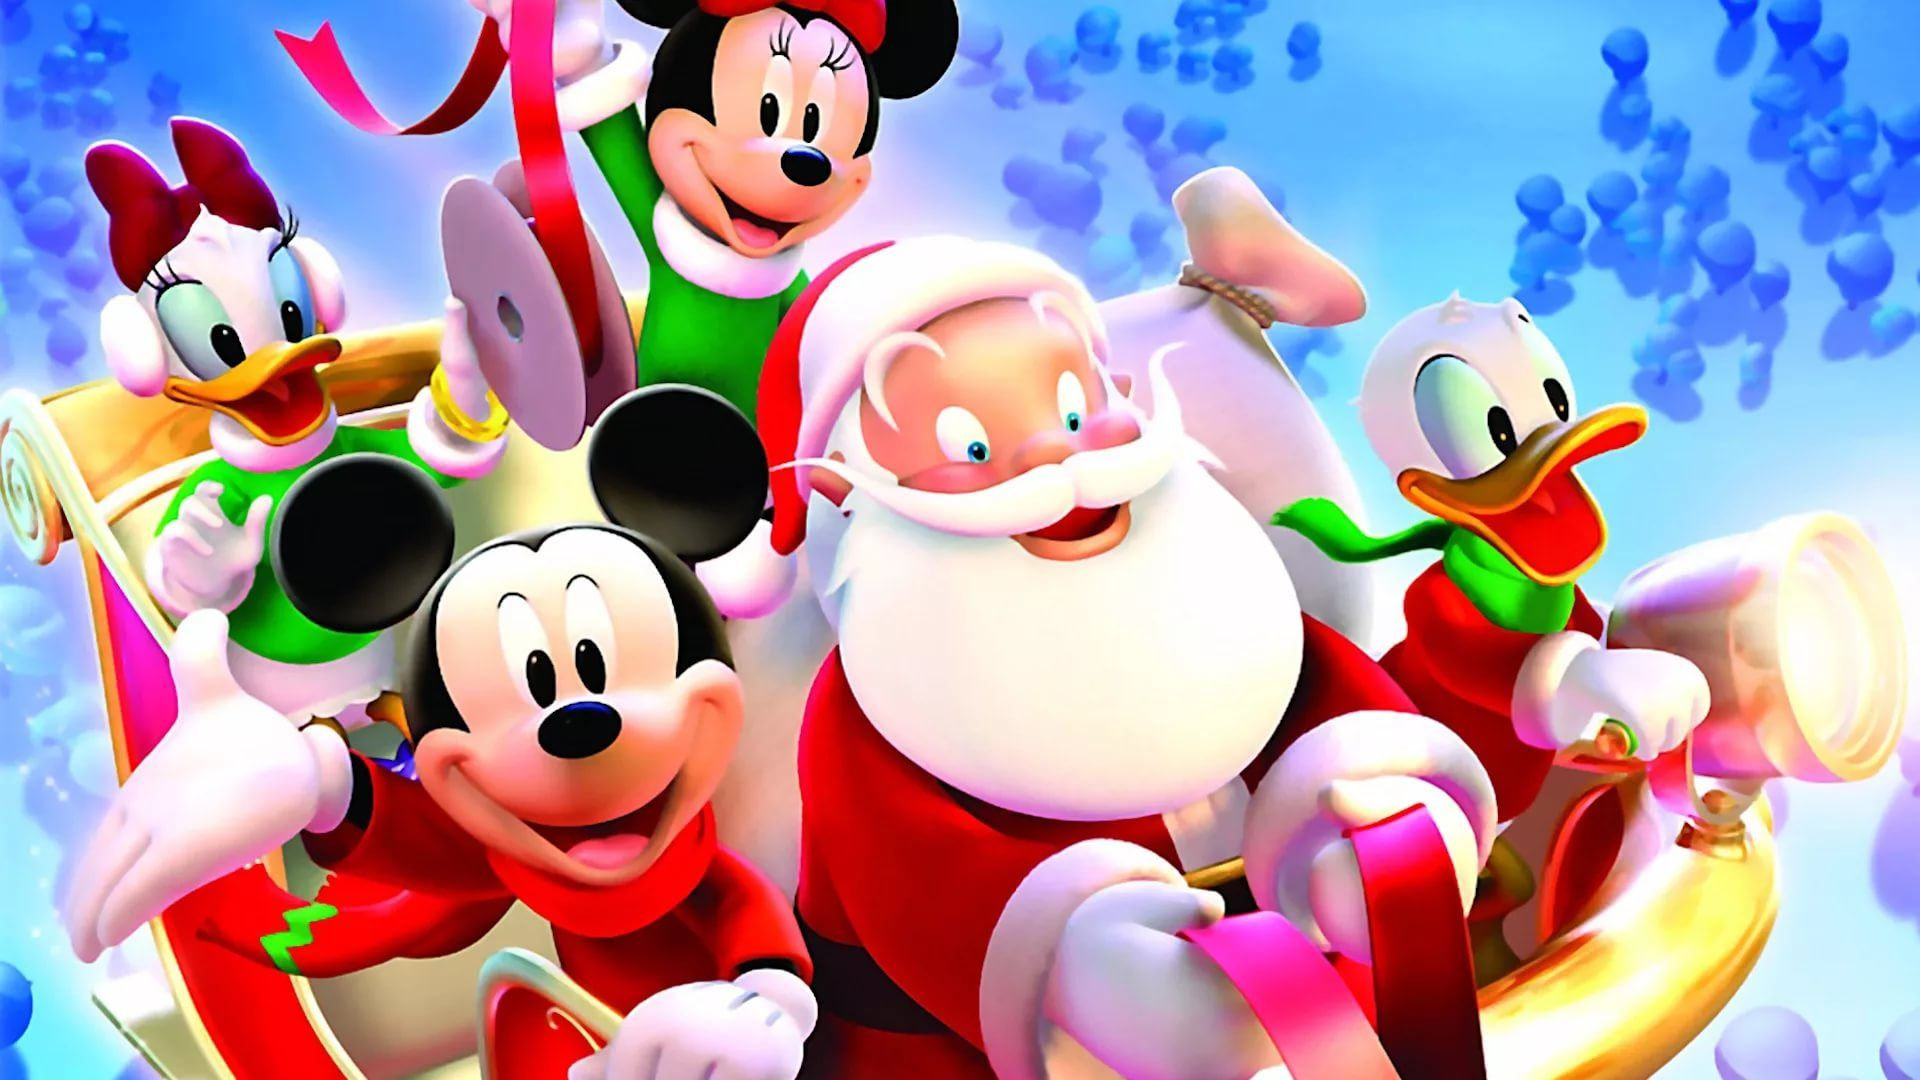 Disney Christmas desktop wallpaper download